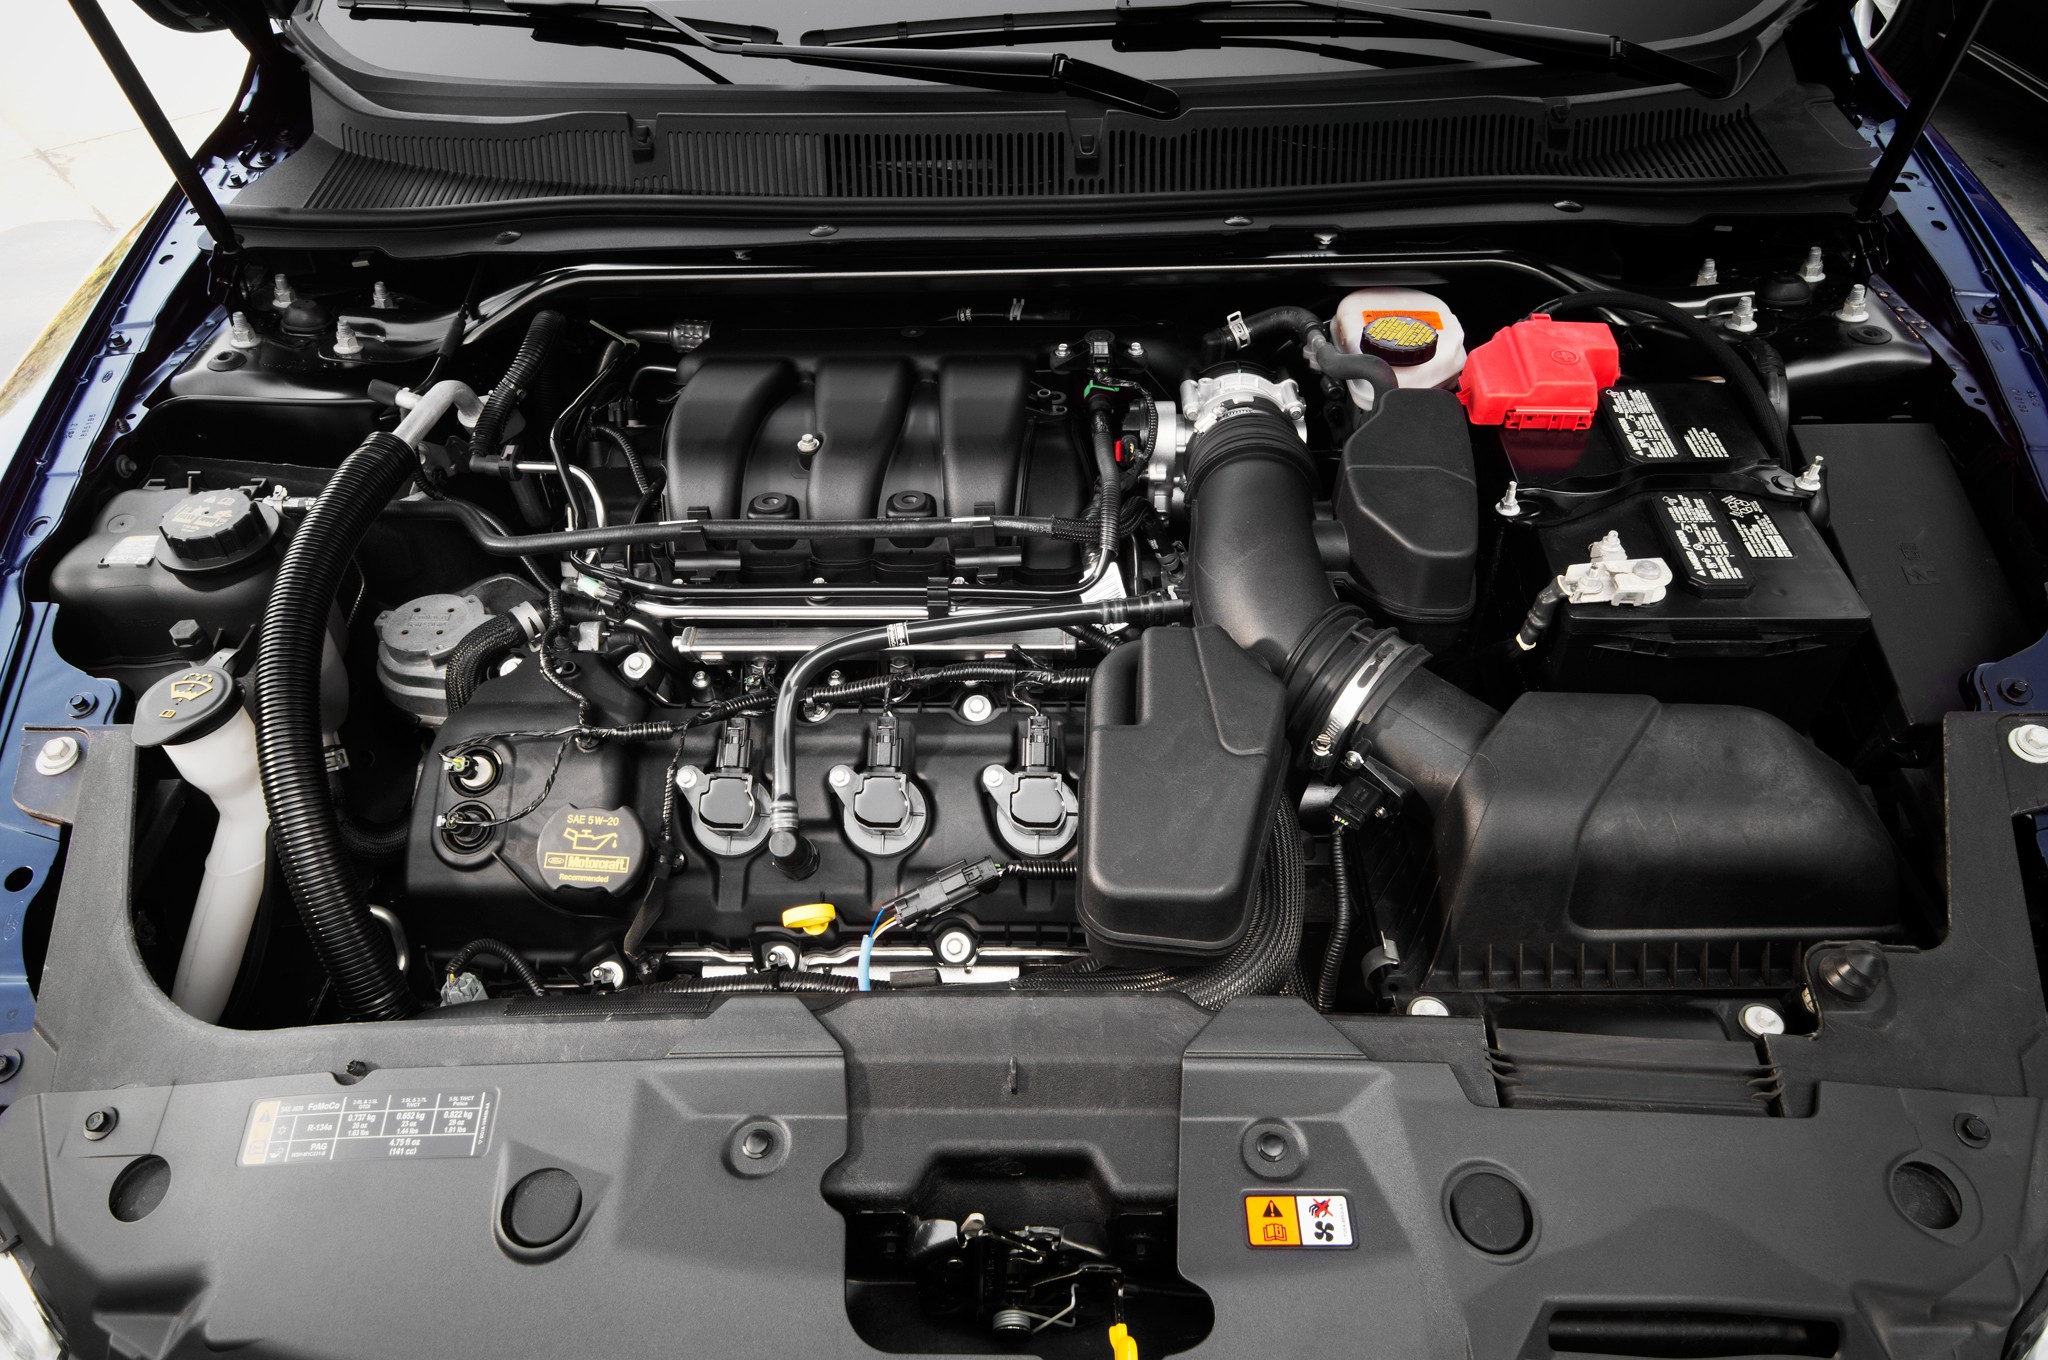 2007 ford Taurus Engine Diagram ford Taurus Price Modifications Pictures Moibibiki Of 2007 ford Taurus Engine Diagram